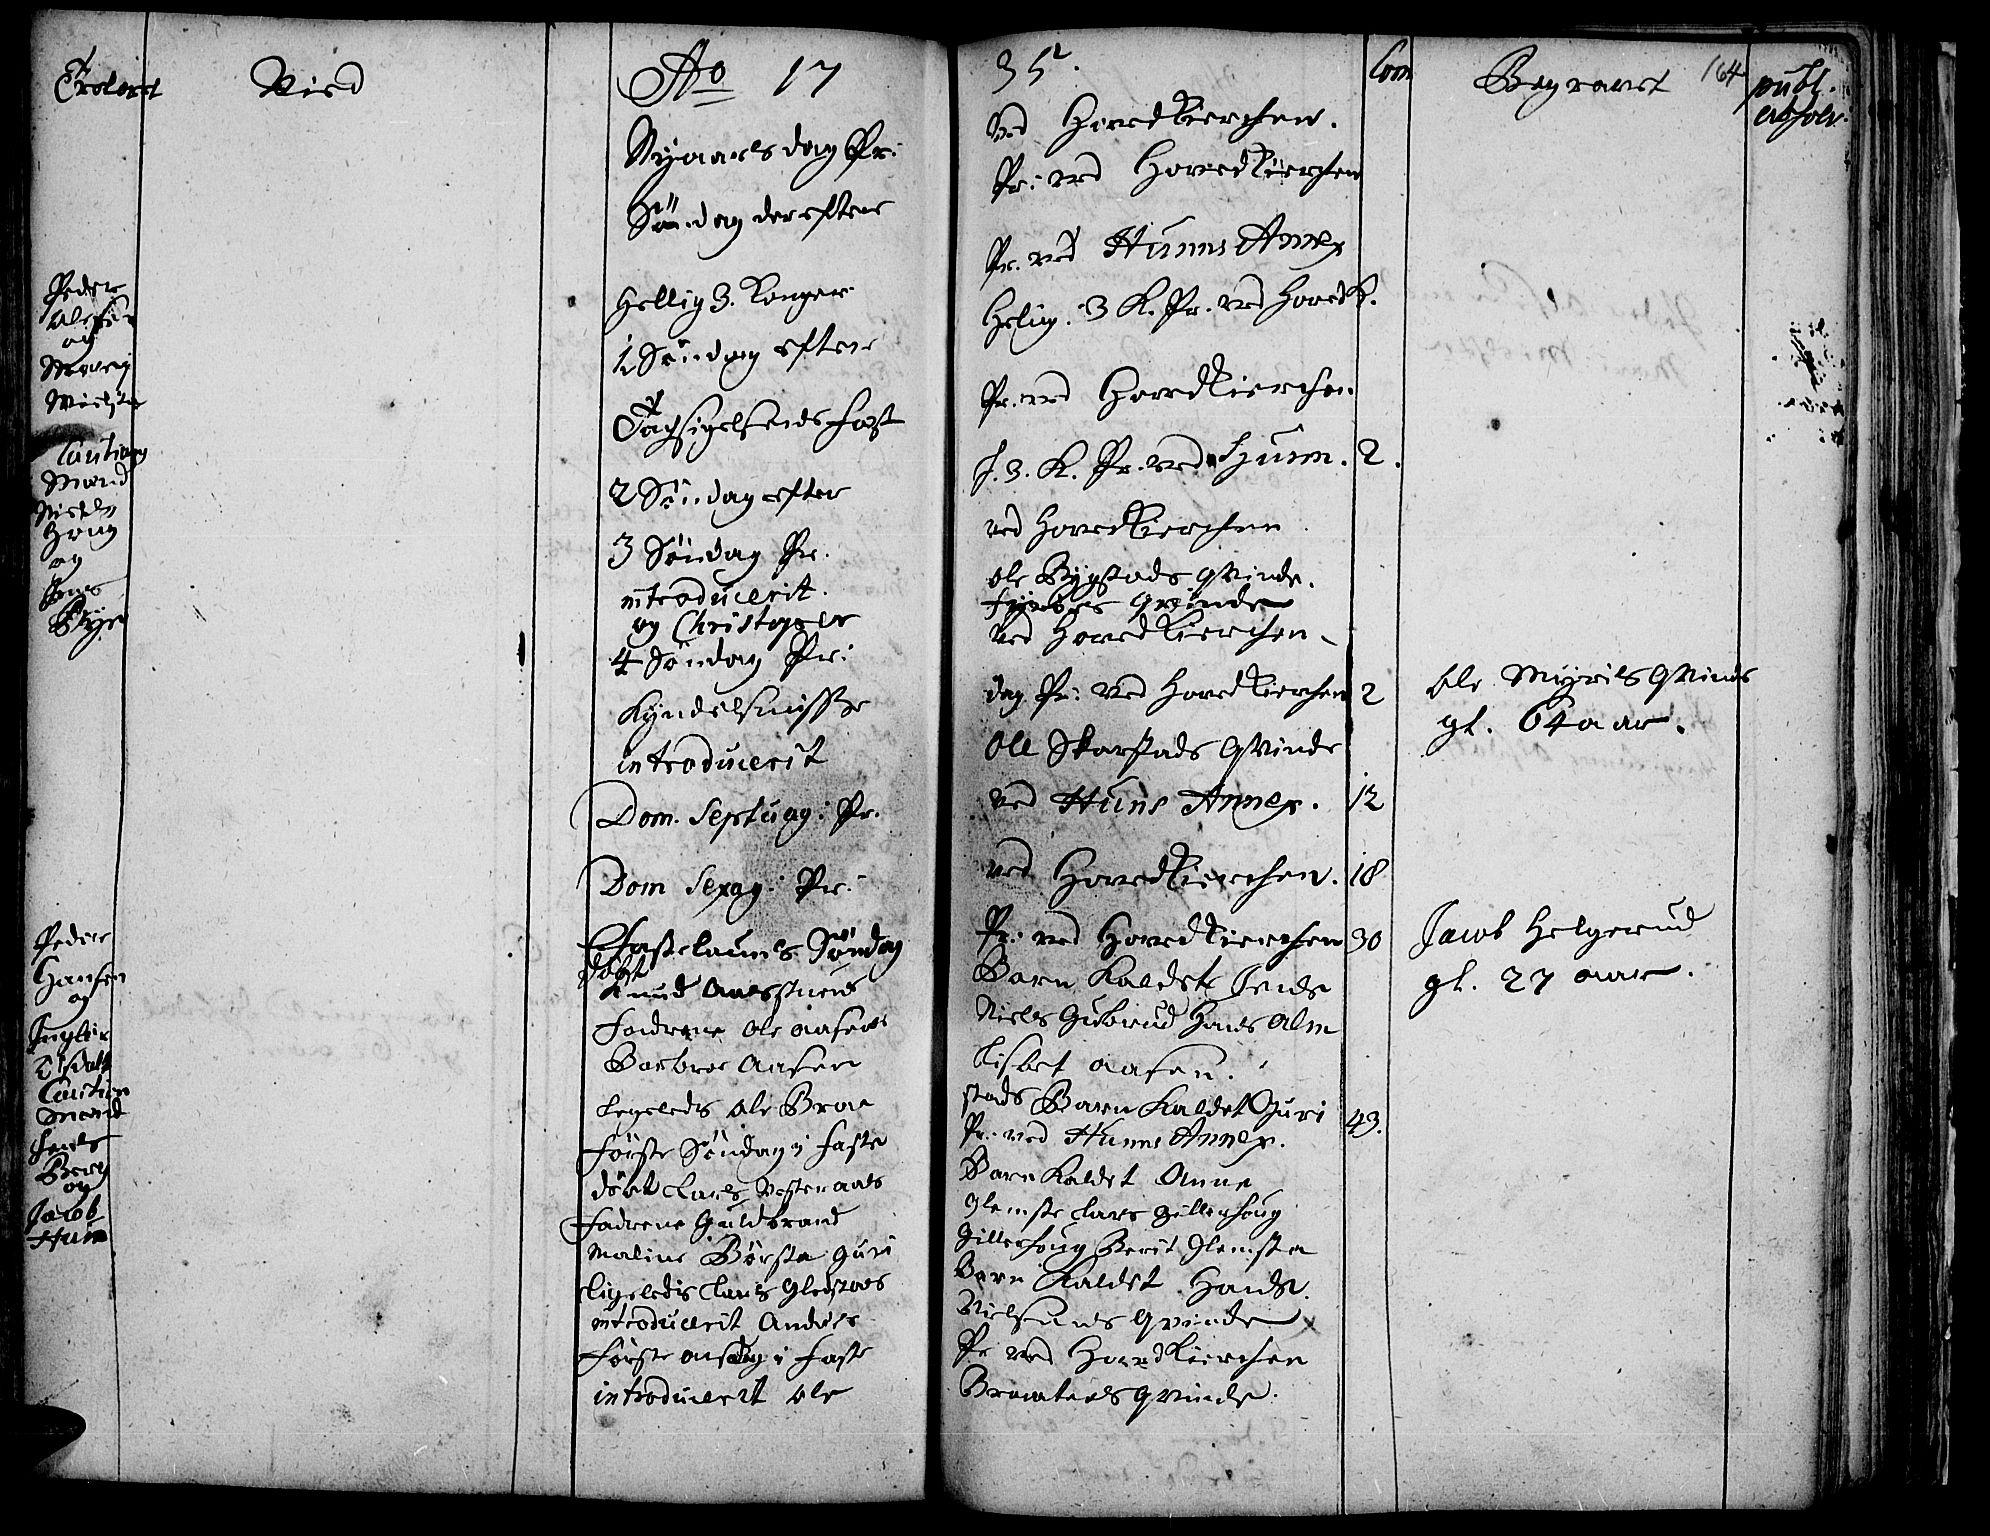 SAH, Vardal prestekontor, H/Ha/Haa/L0001: Ministerialbok nr. 1, 1706-1748, s. 164